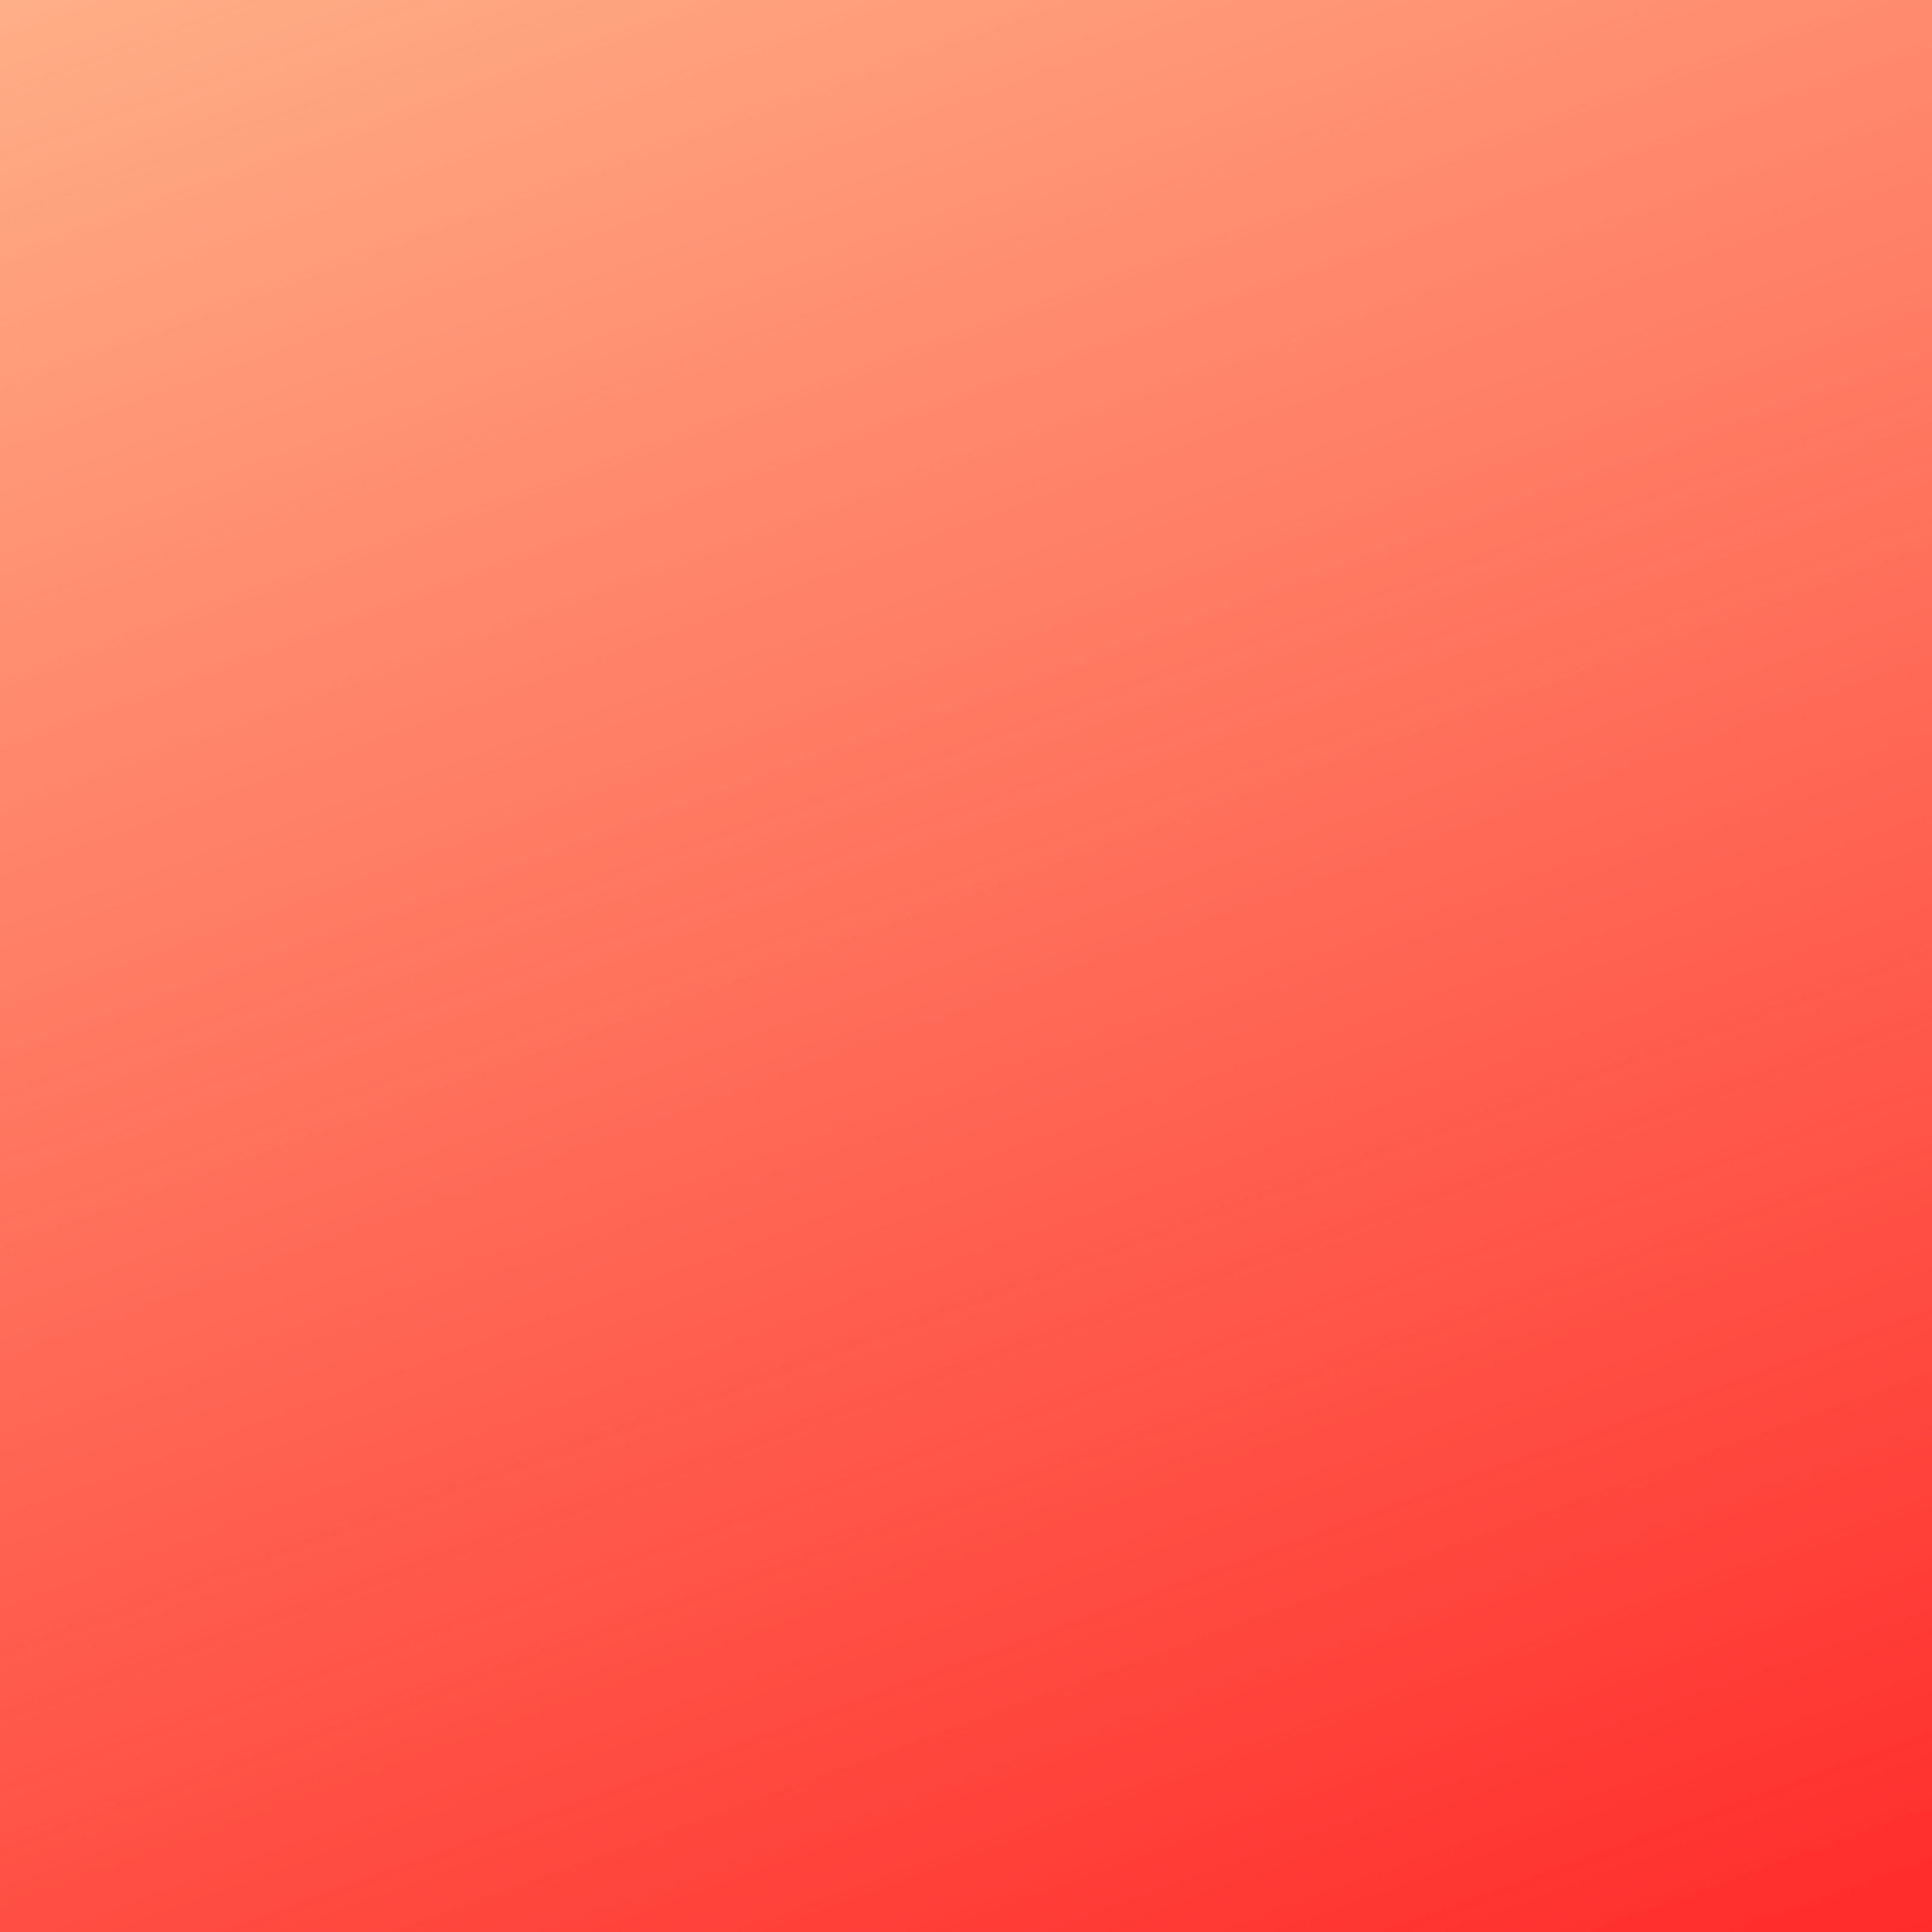 Red Background Gradient iPad Wallpaper